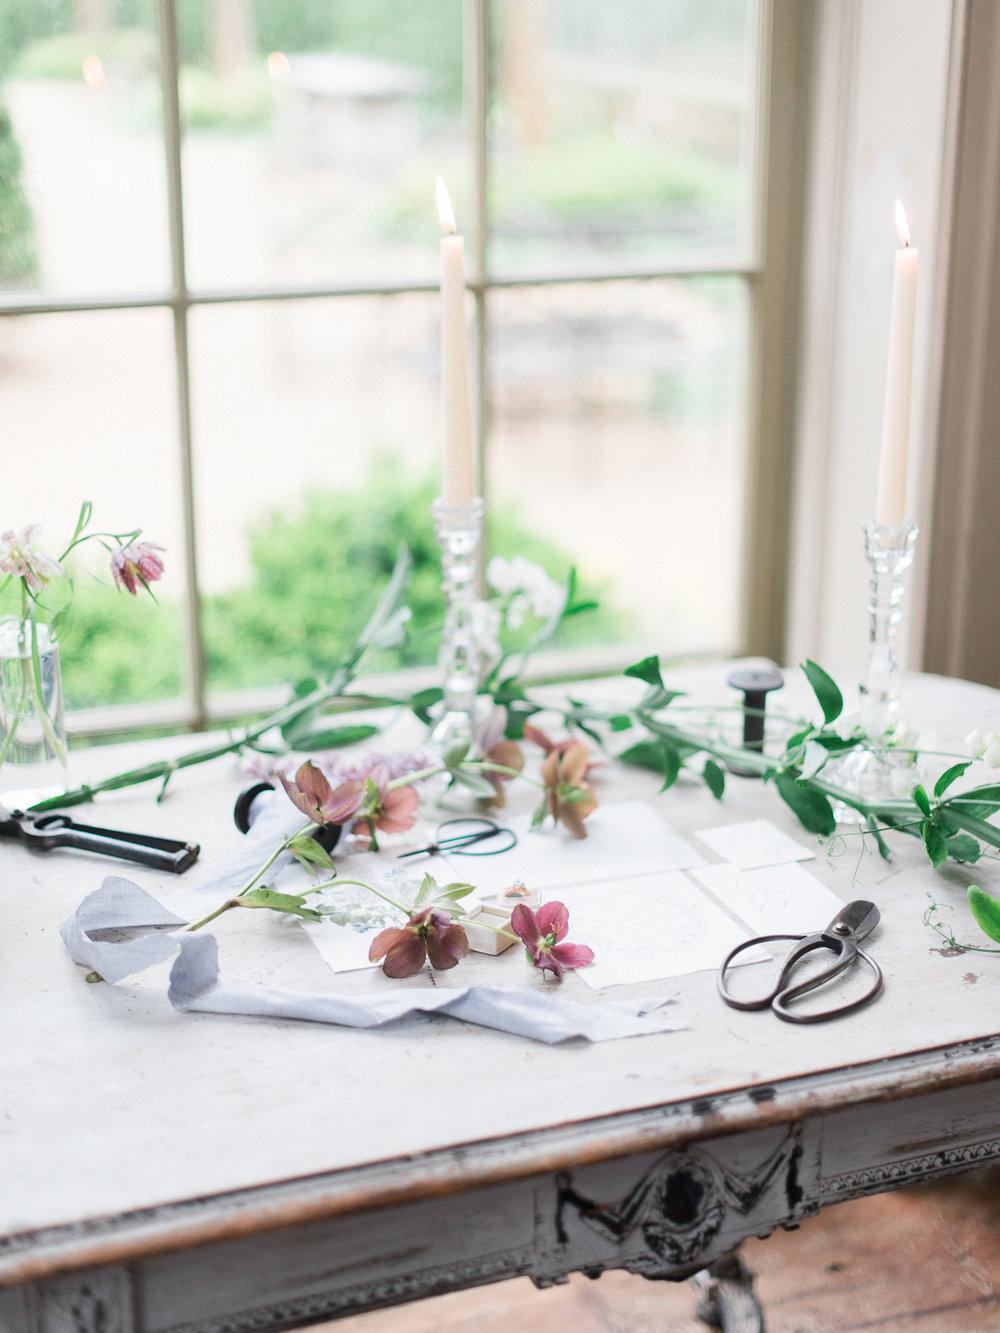 christinadavisphotography+romantic+greenhouse+jardindebuis+styledshoot32.jpg